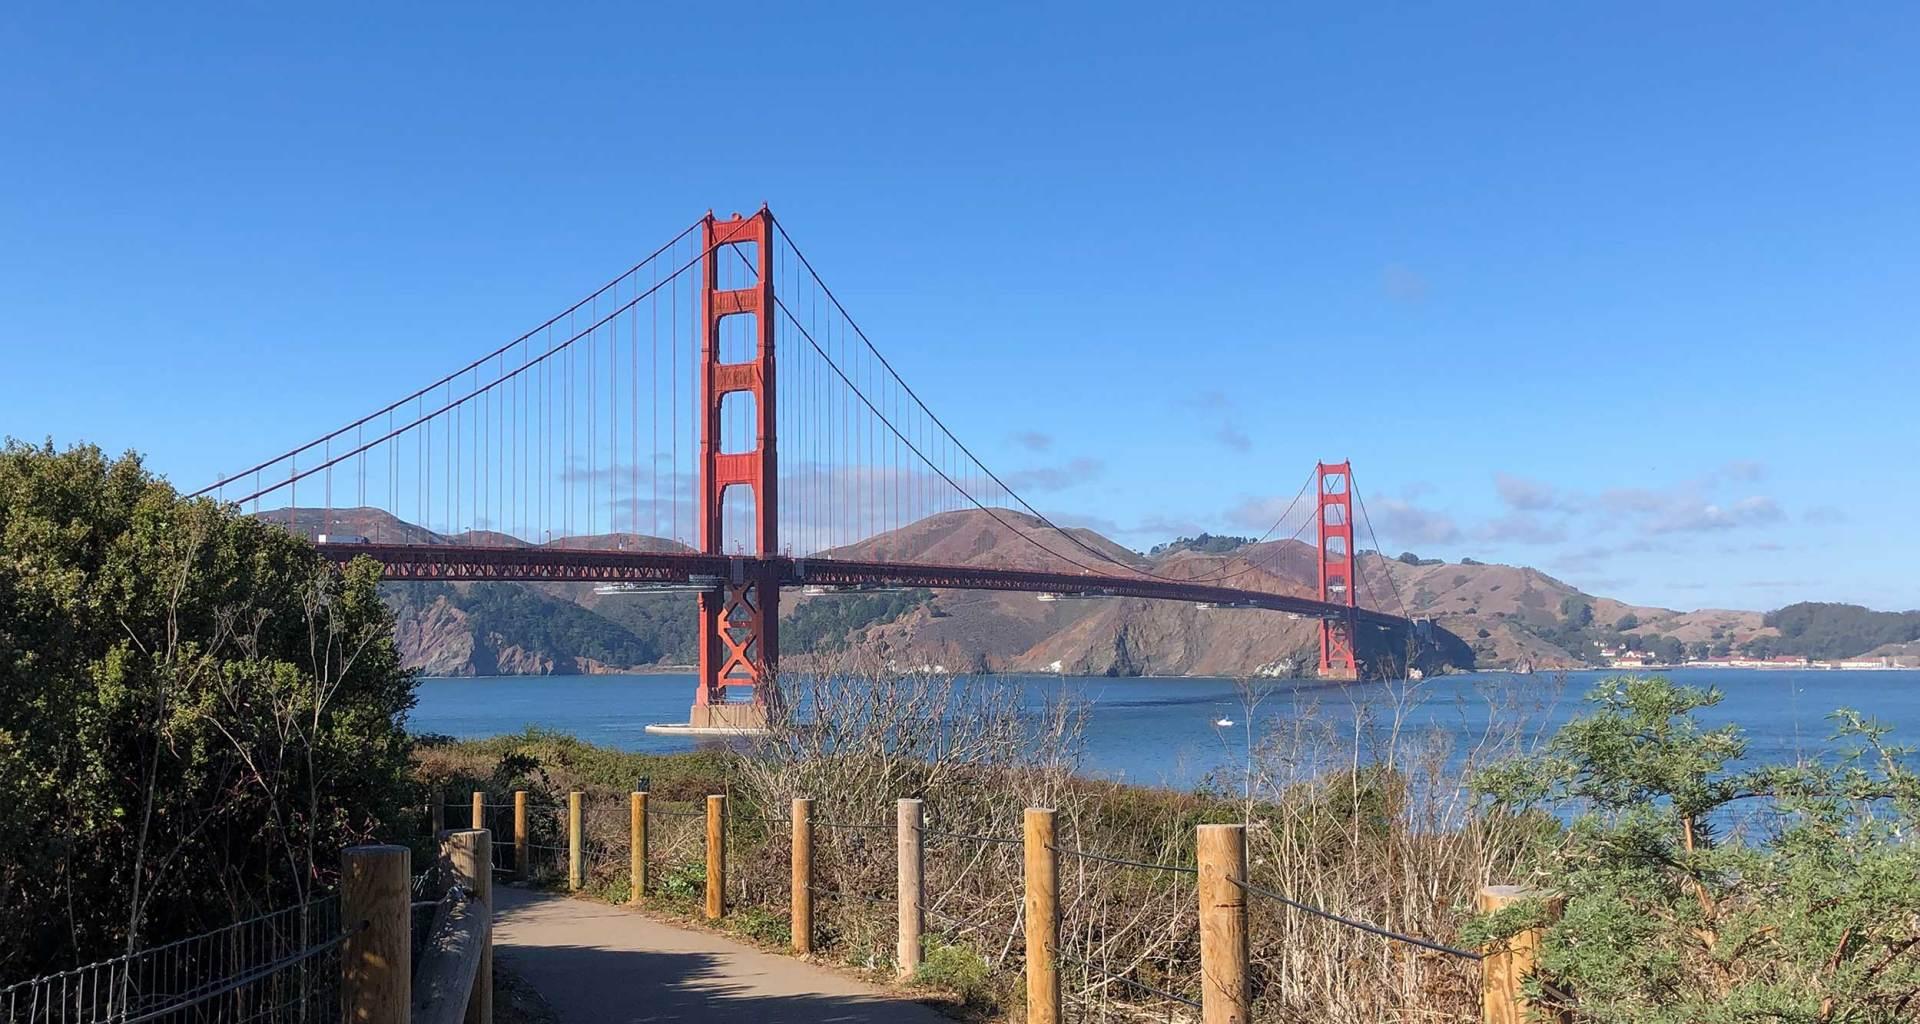 Golden Gate Bridge against a clear blue sky.